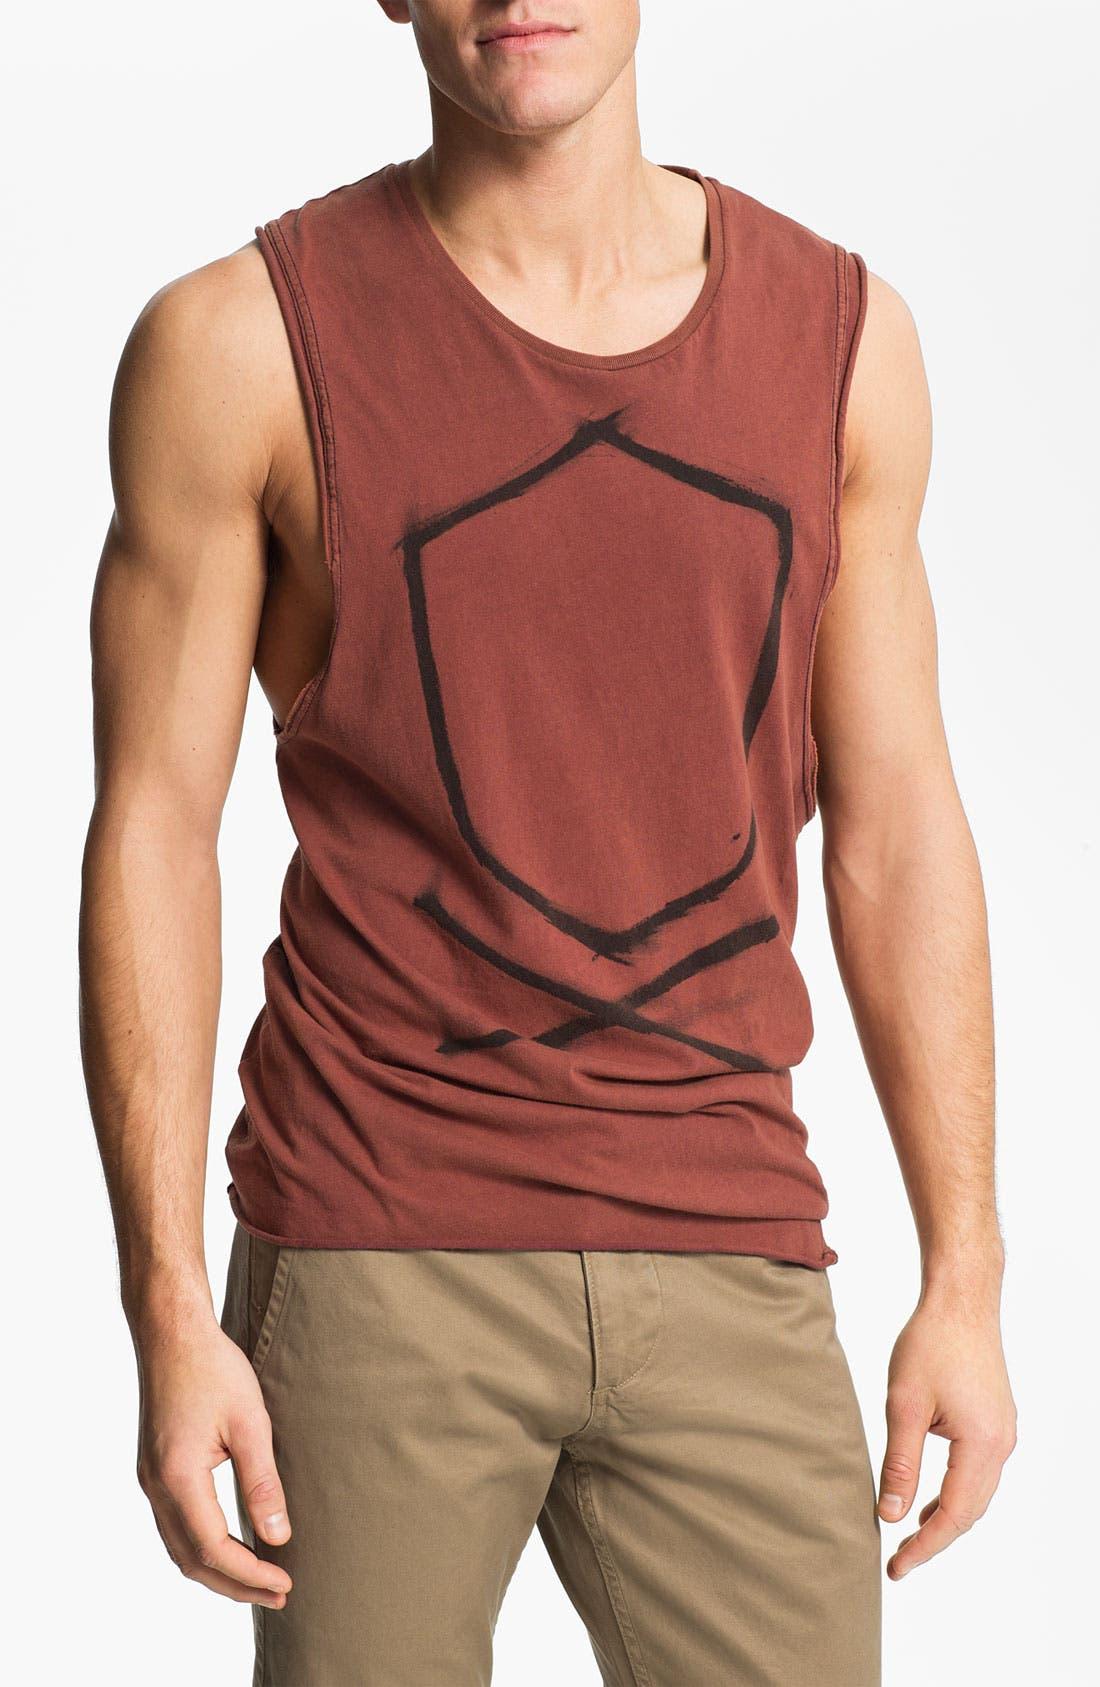 Alternate Image 1 Selected - Zanerobe 'Z Bones' Print Muscle T-Shirt